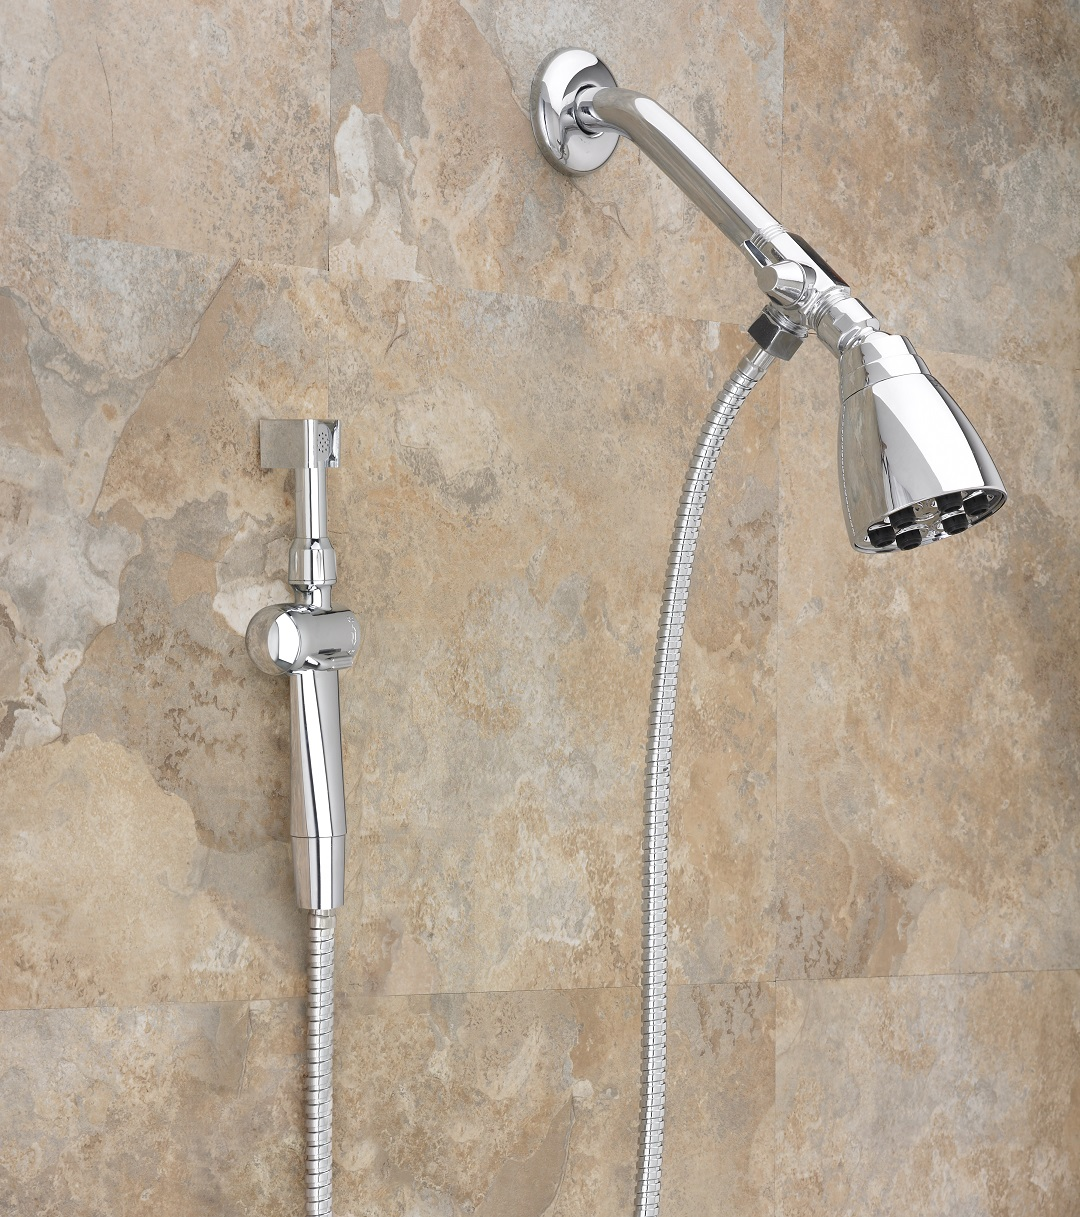 Aquaus 360 Hand Held Bidet for Shower w Stainless Steel